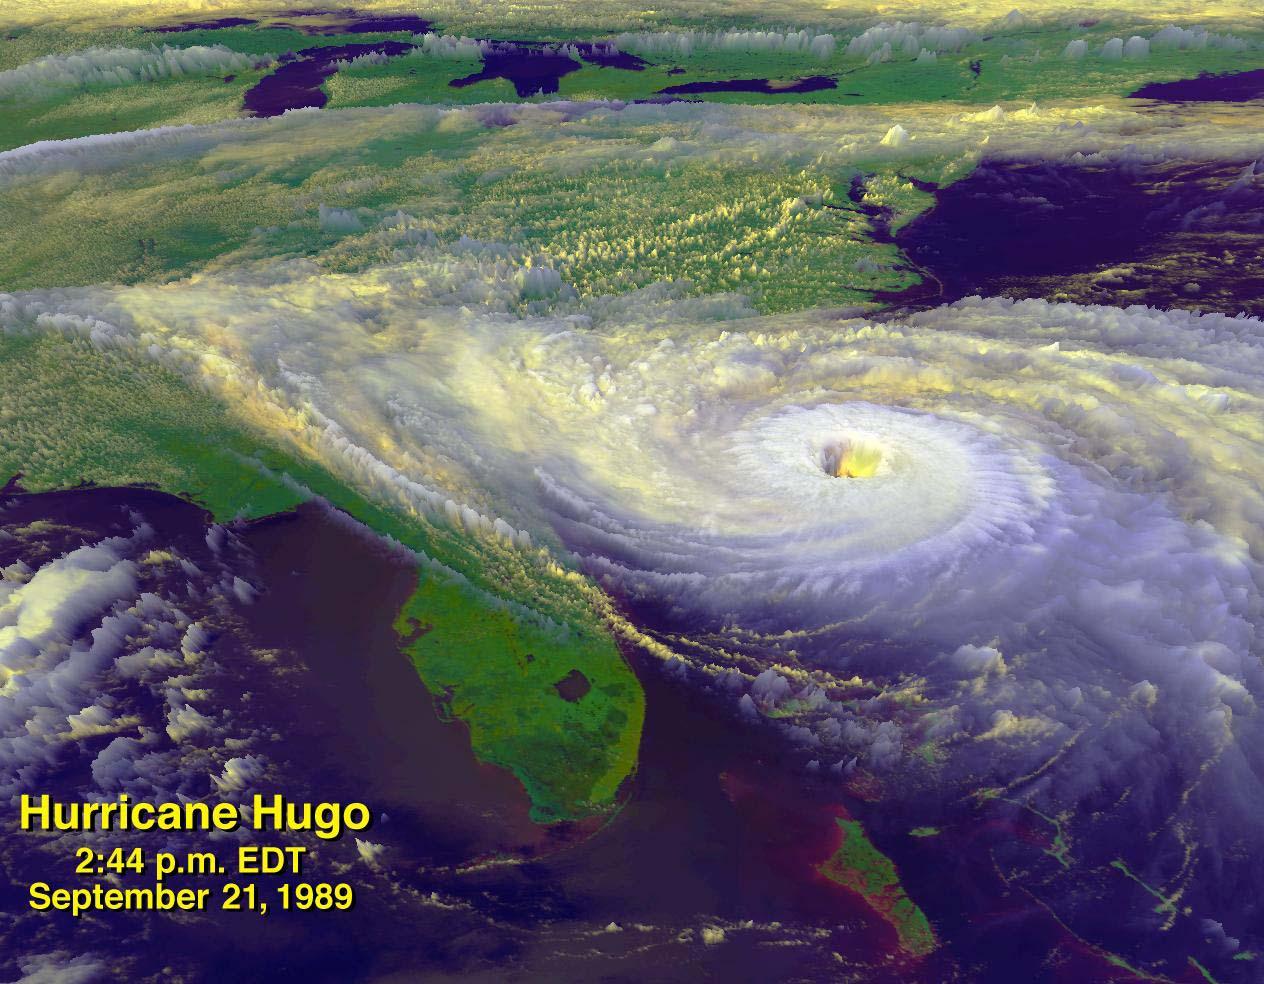 hurricane Shutters Masonry Anchor Bits, Storm Shutters Anchor Bits, Security Shutters Masonry Anchor Bits combination bit cd-14 hurricane hugo